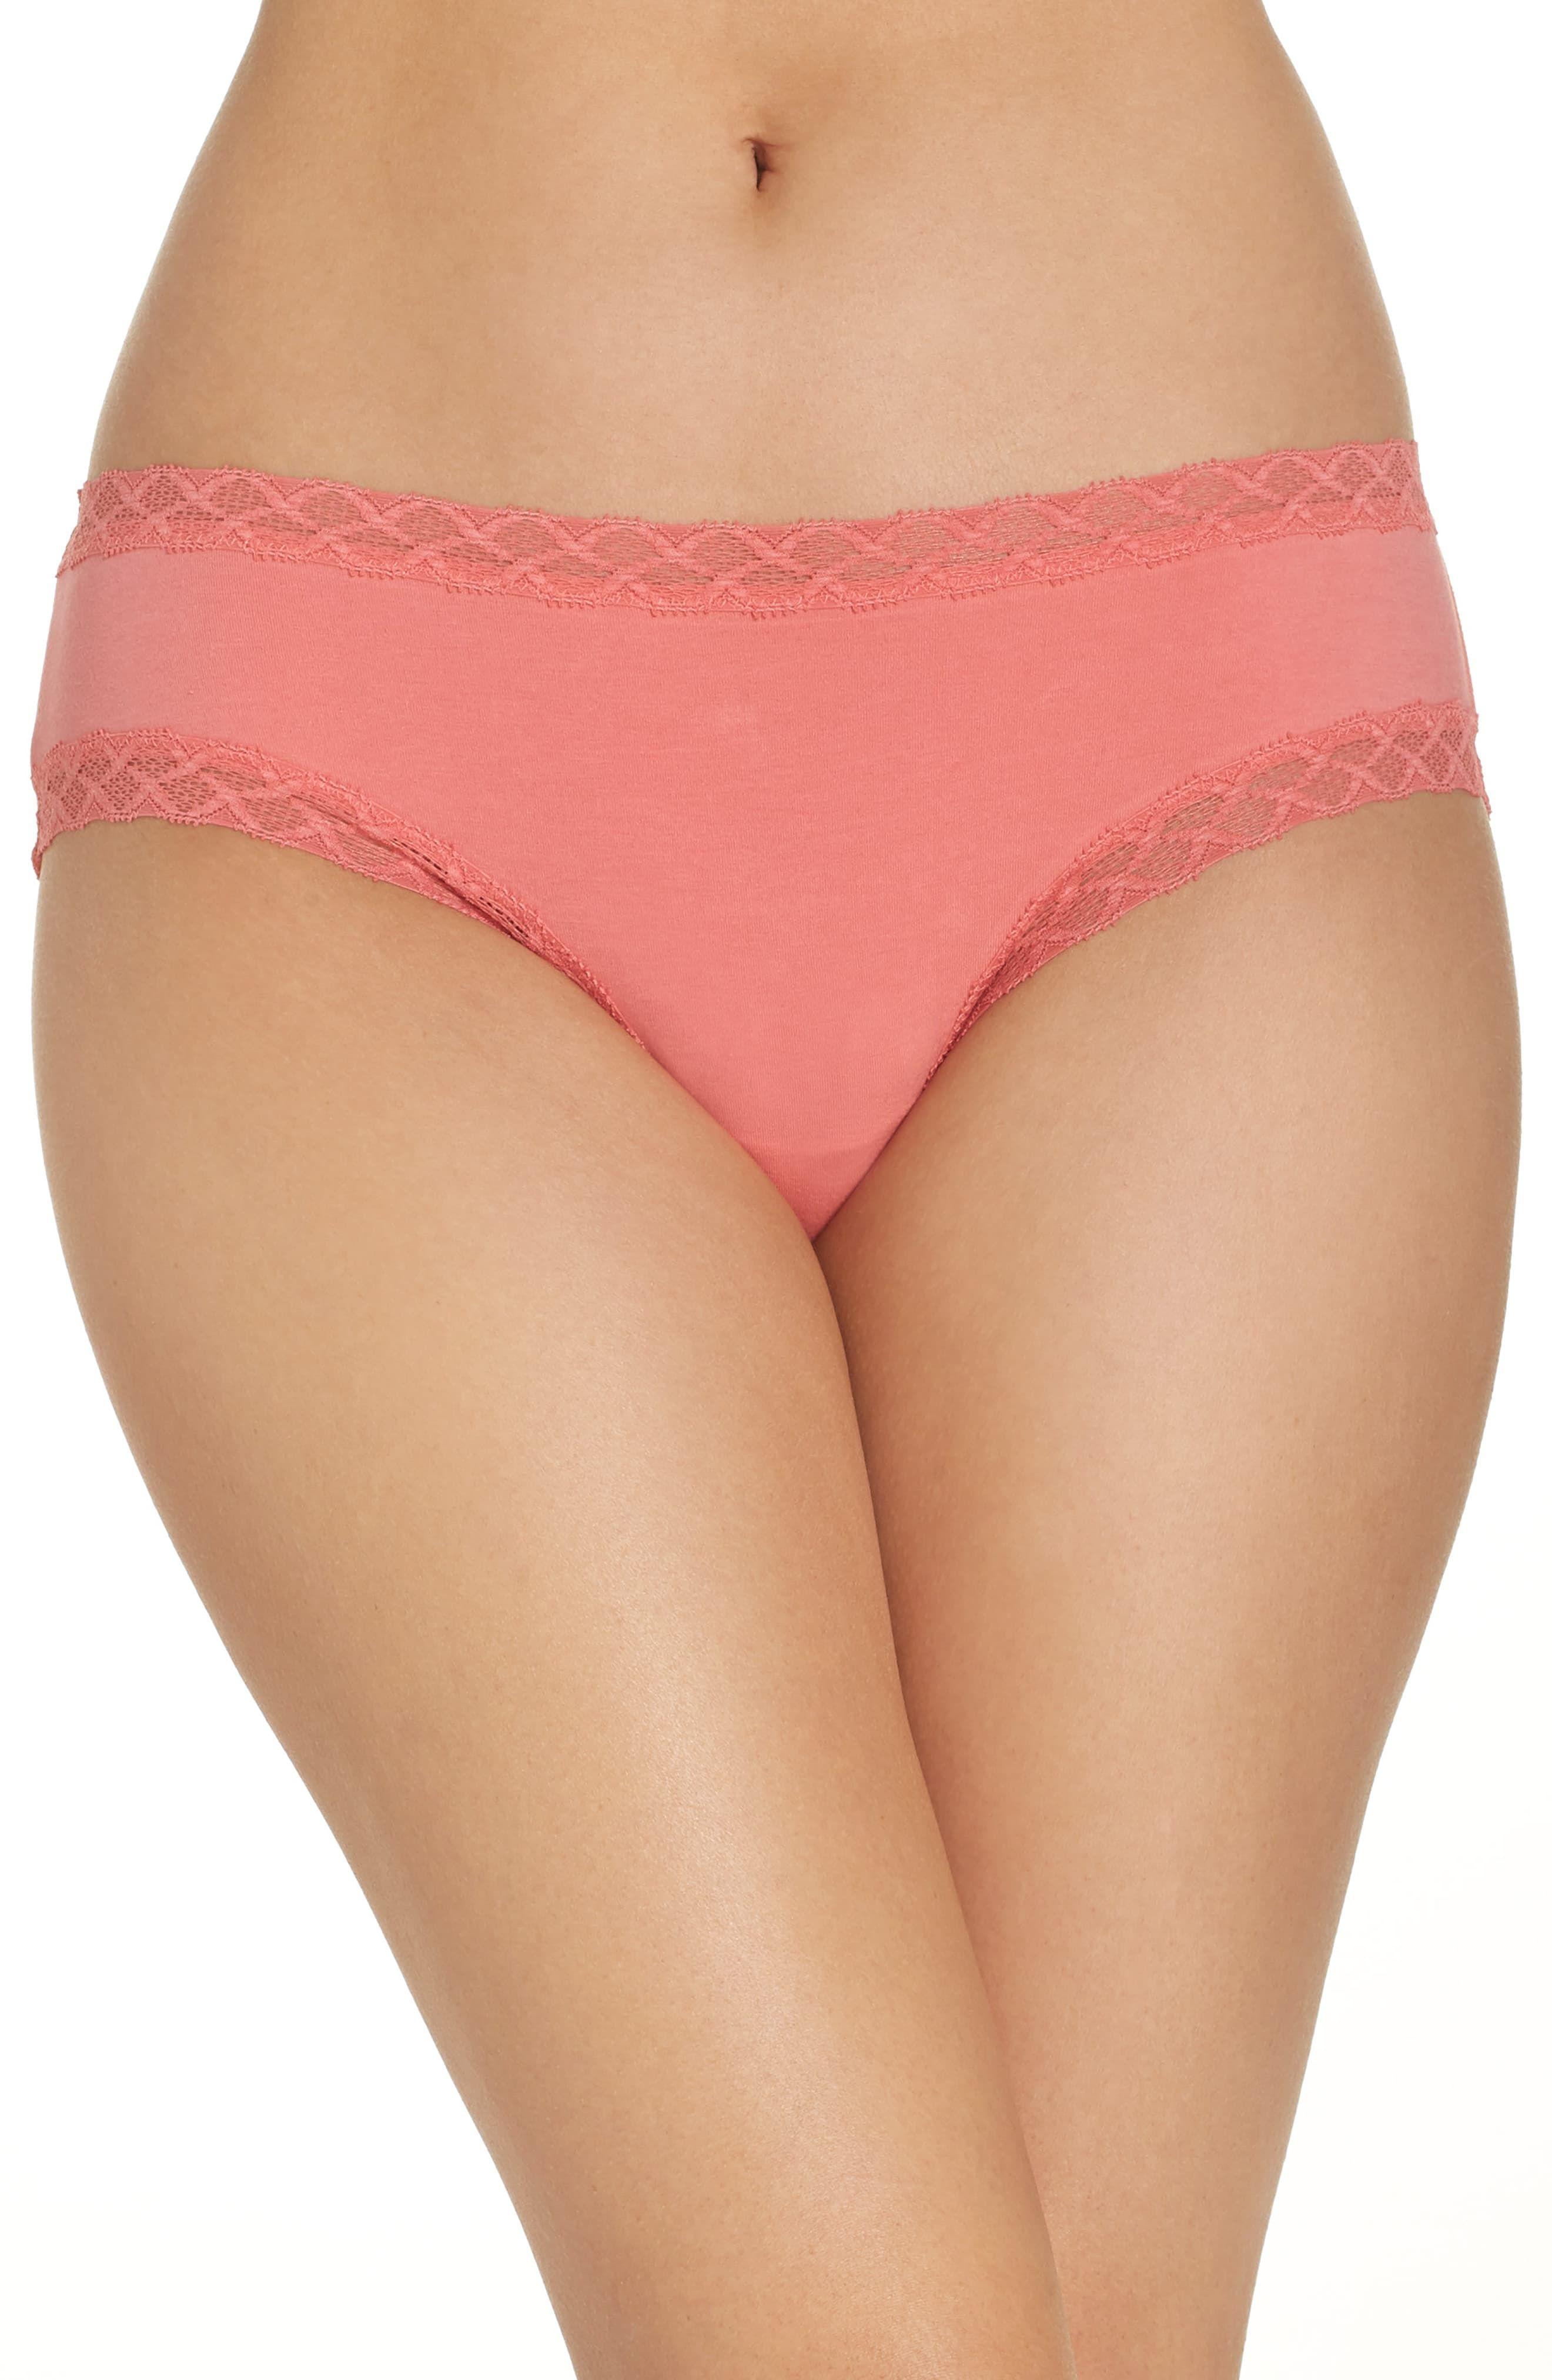 Best Panties Pics : panties, Underwear, Brands, Panties, Women